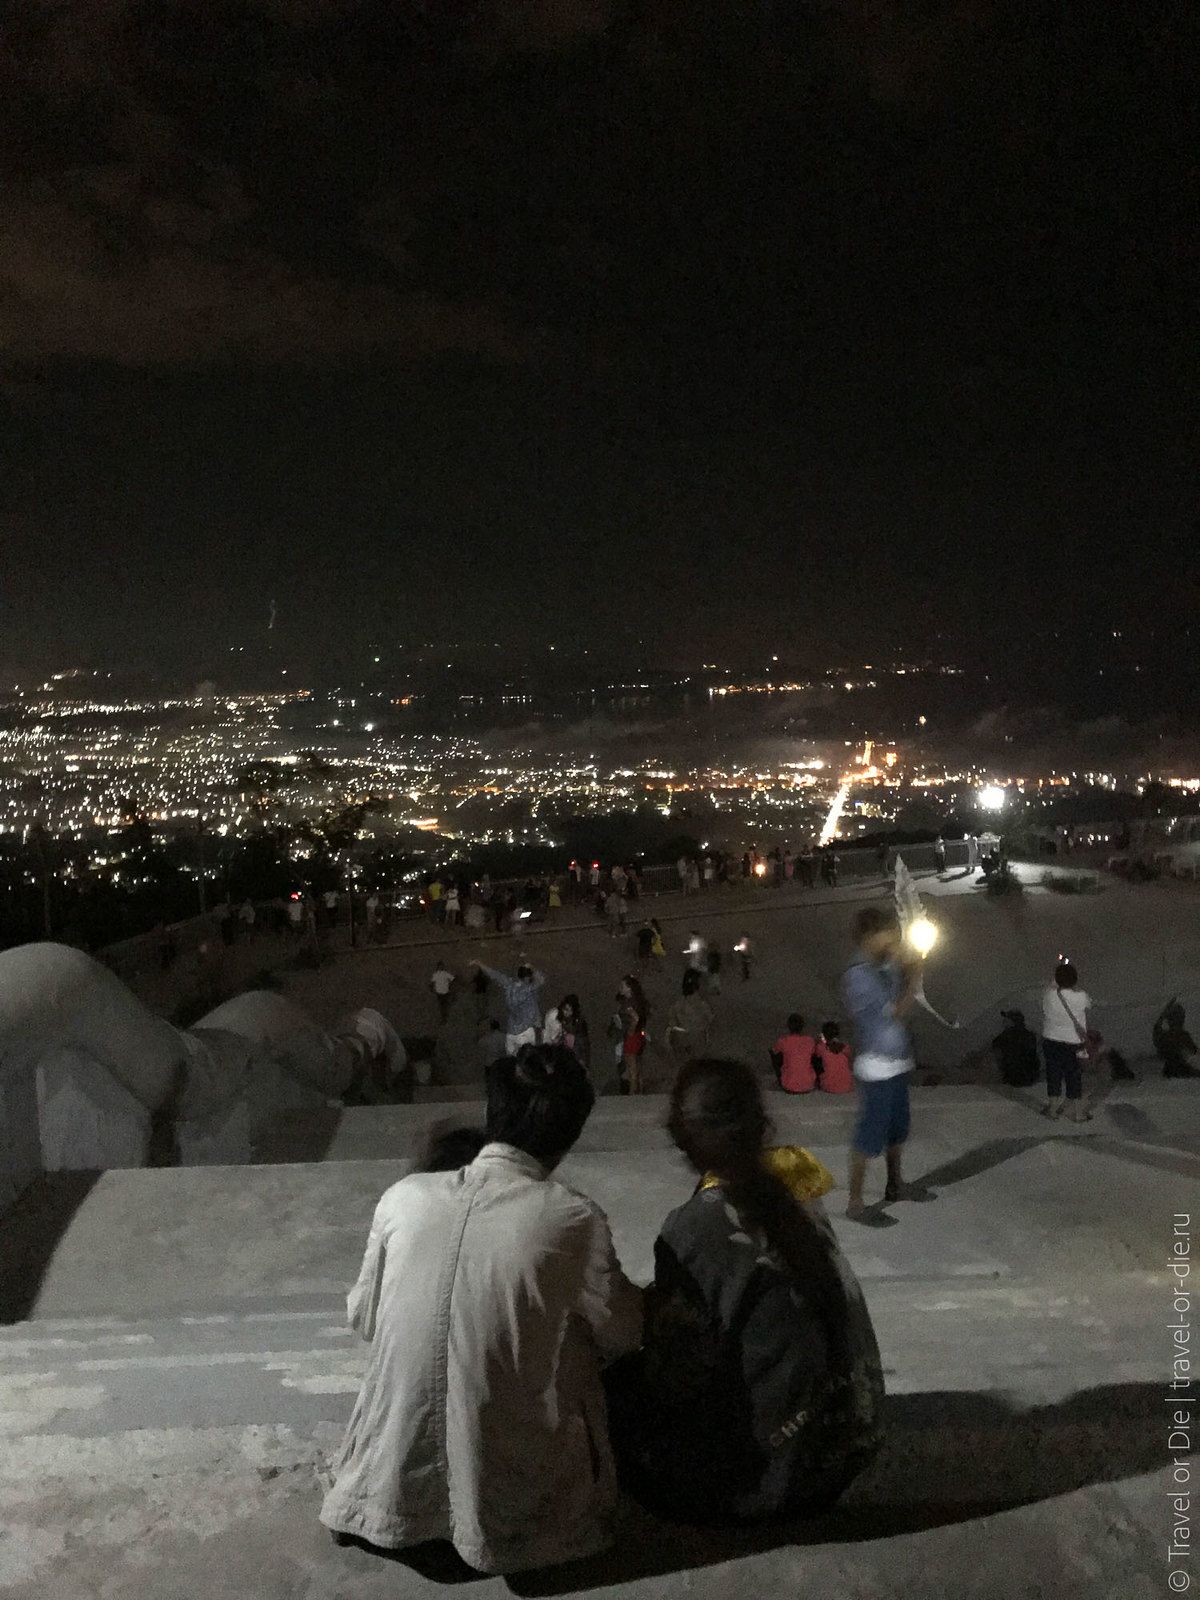 Big-Buddha-Phuket-Большой-Будда-на-Пхукете-ночью-0940